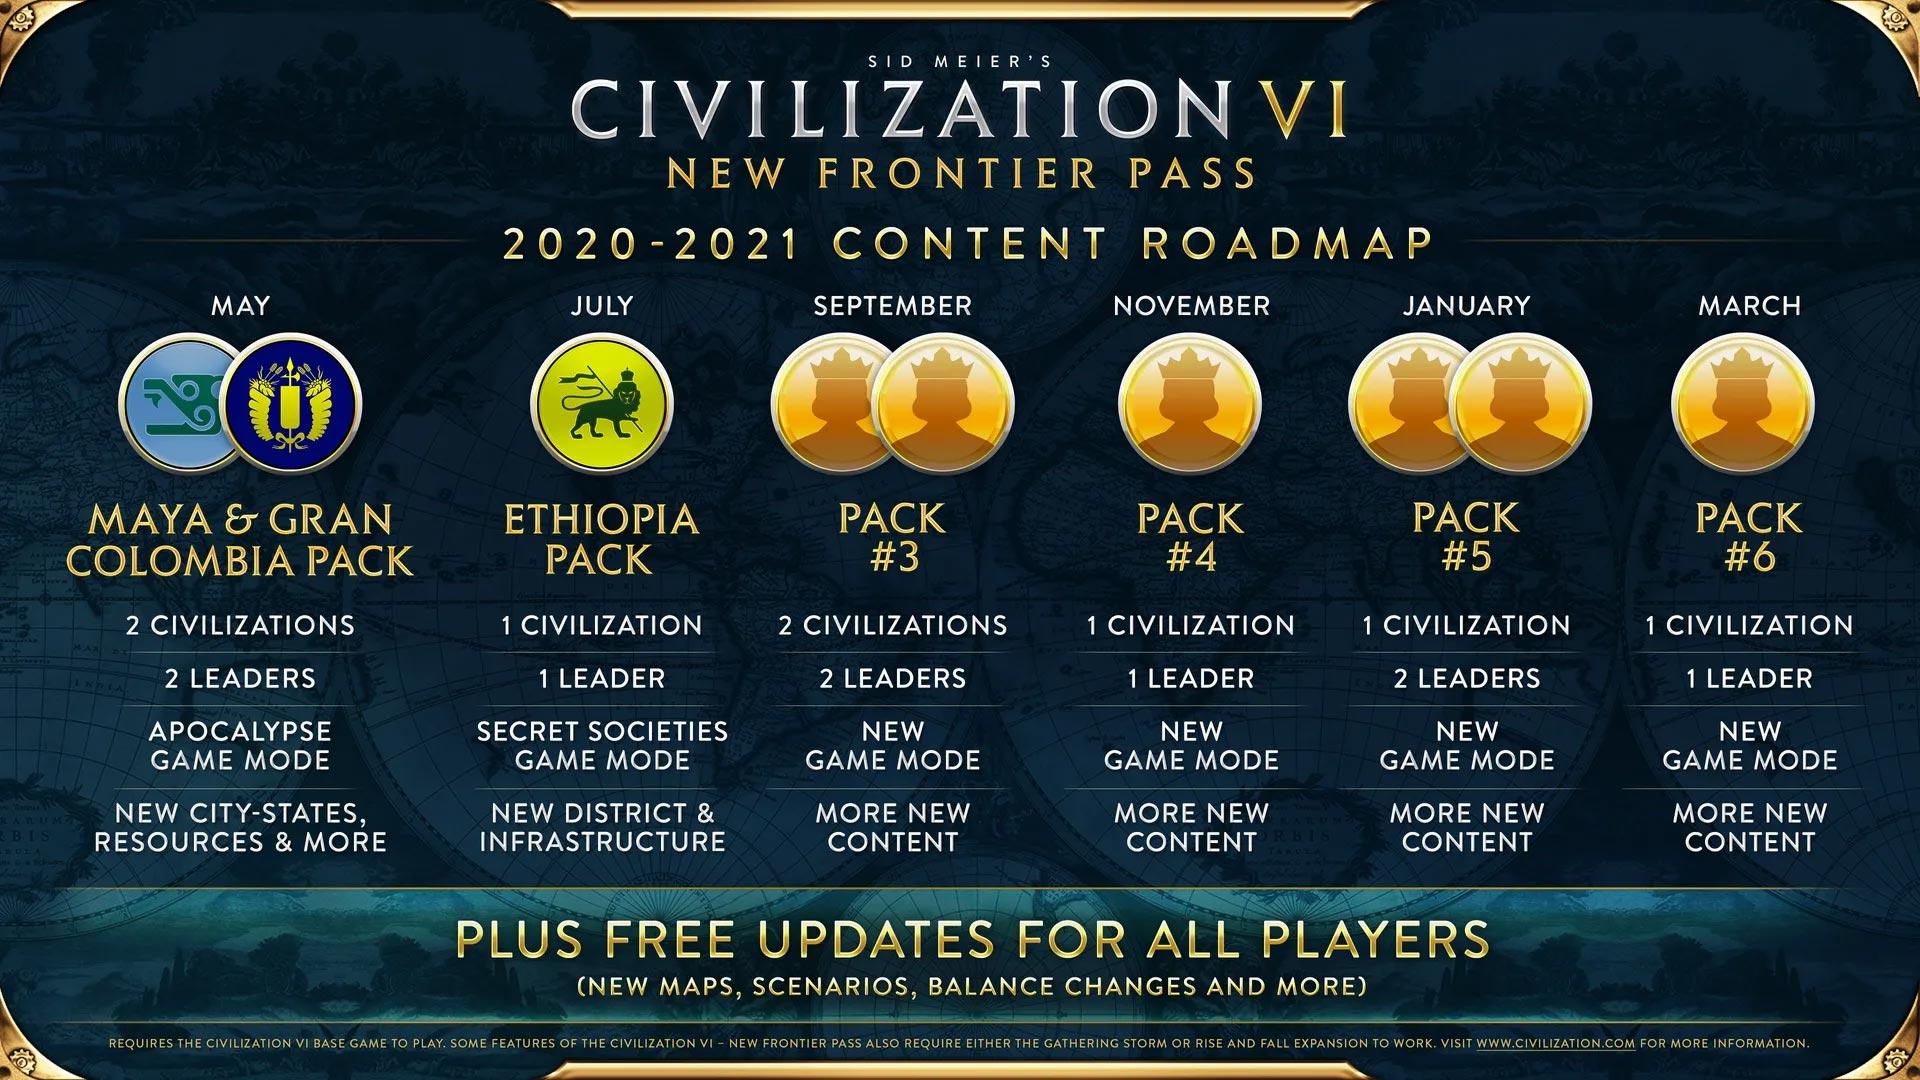 Civilization VI - New Frontier Pass Roadmap (Release Dates)